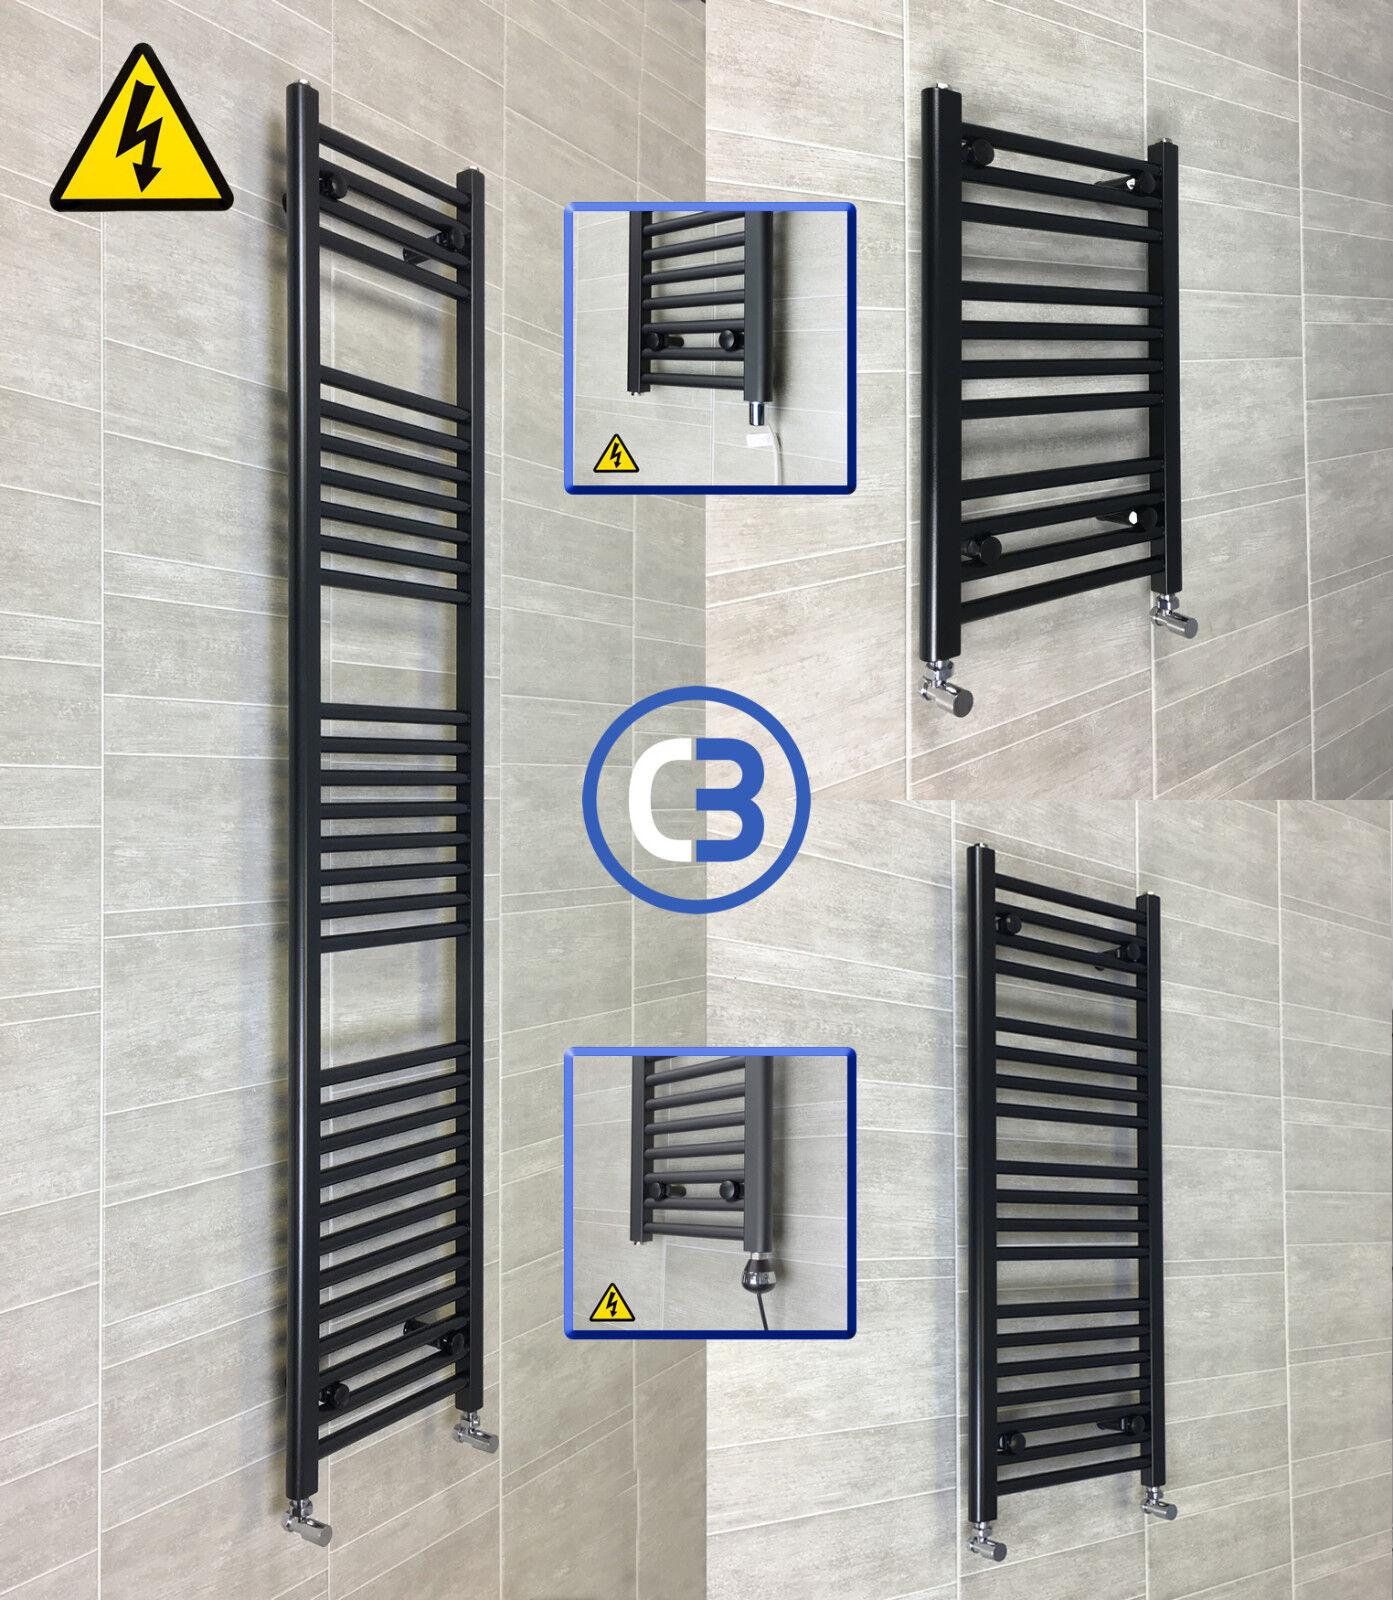 450mm Wide 1800mm High Straight Black Heated Towel Rail Radiator Modern Bathroom